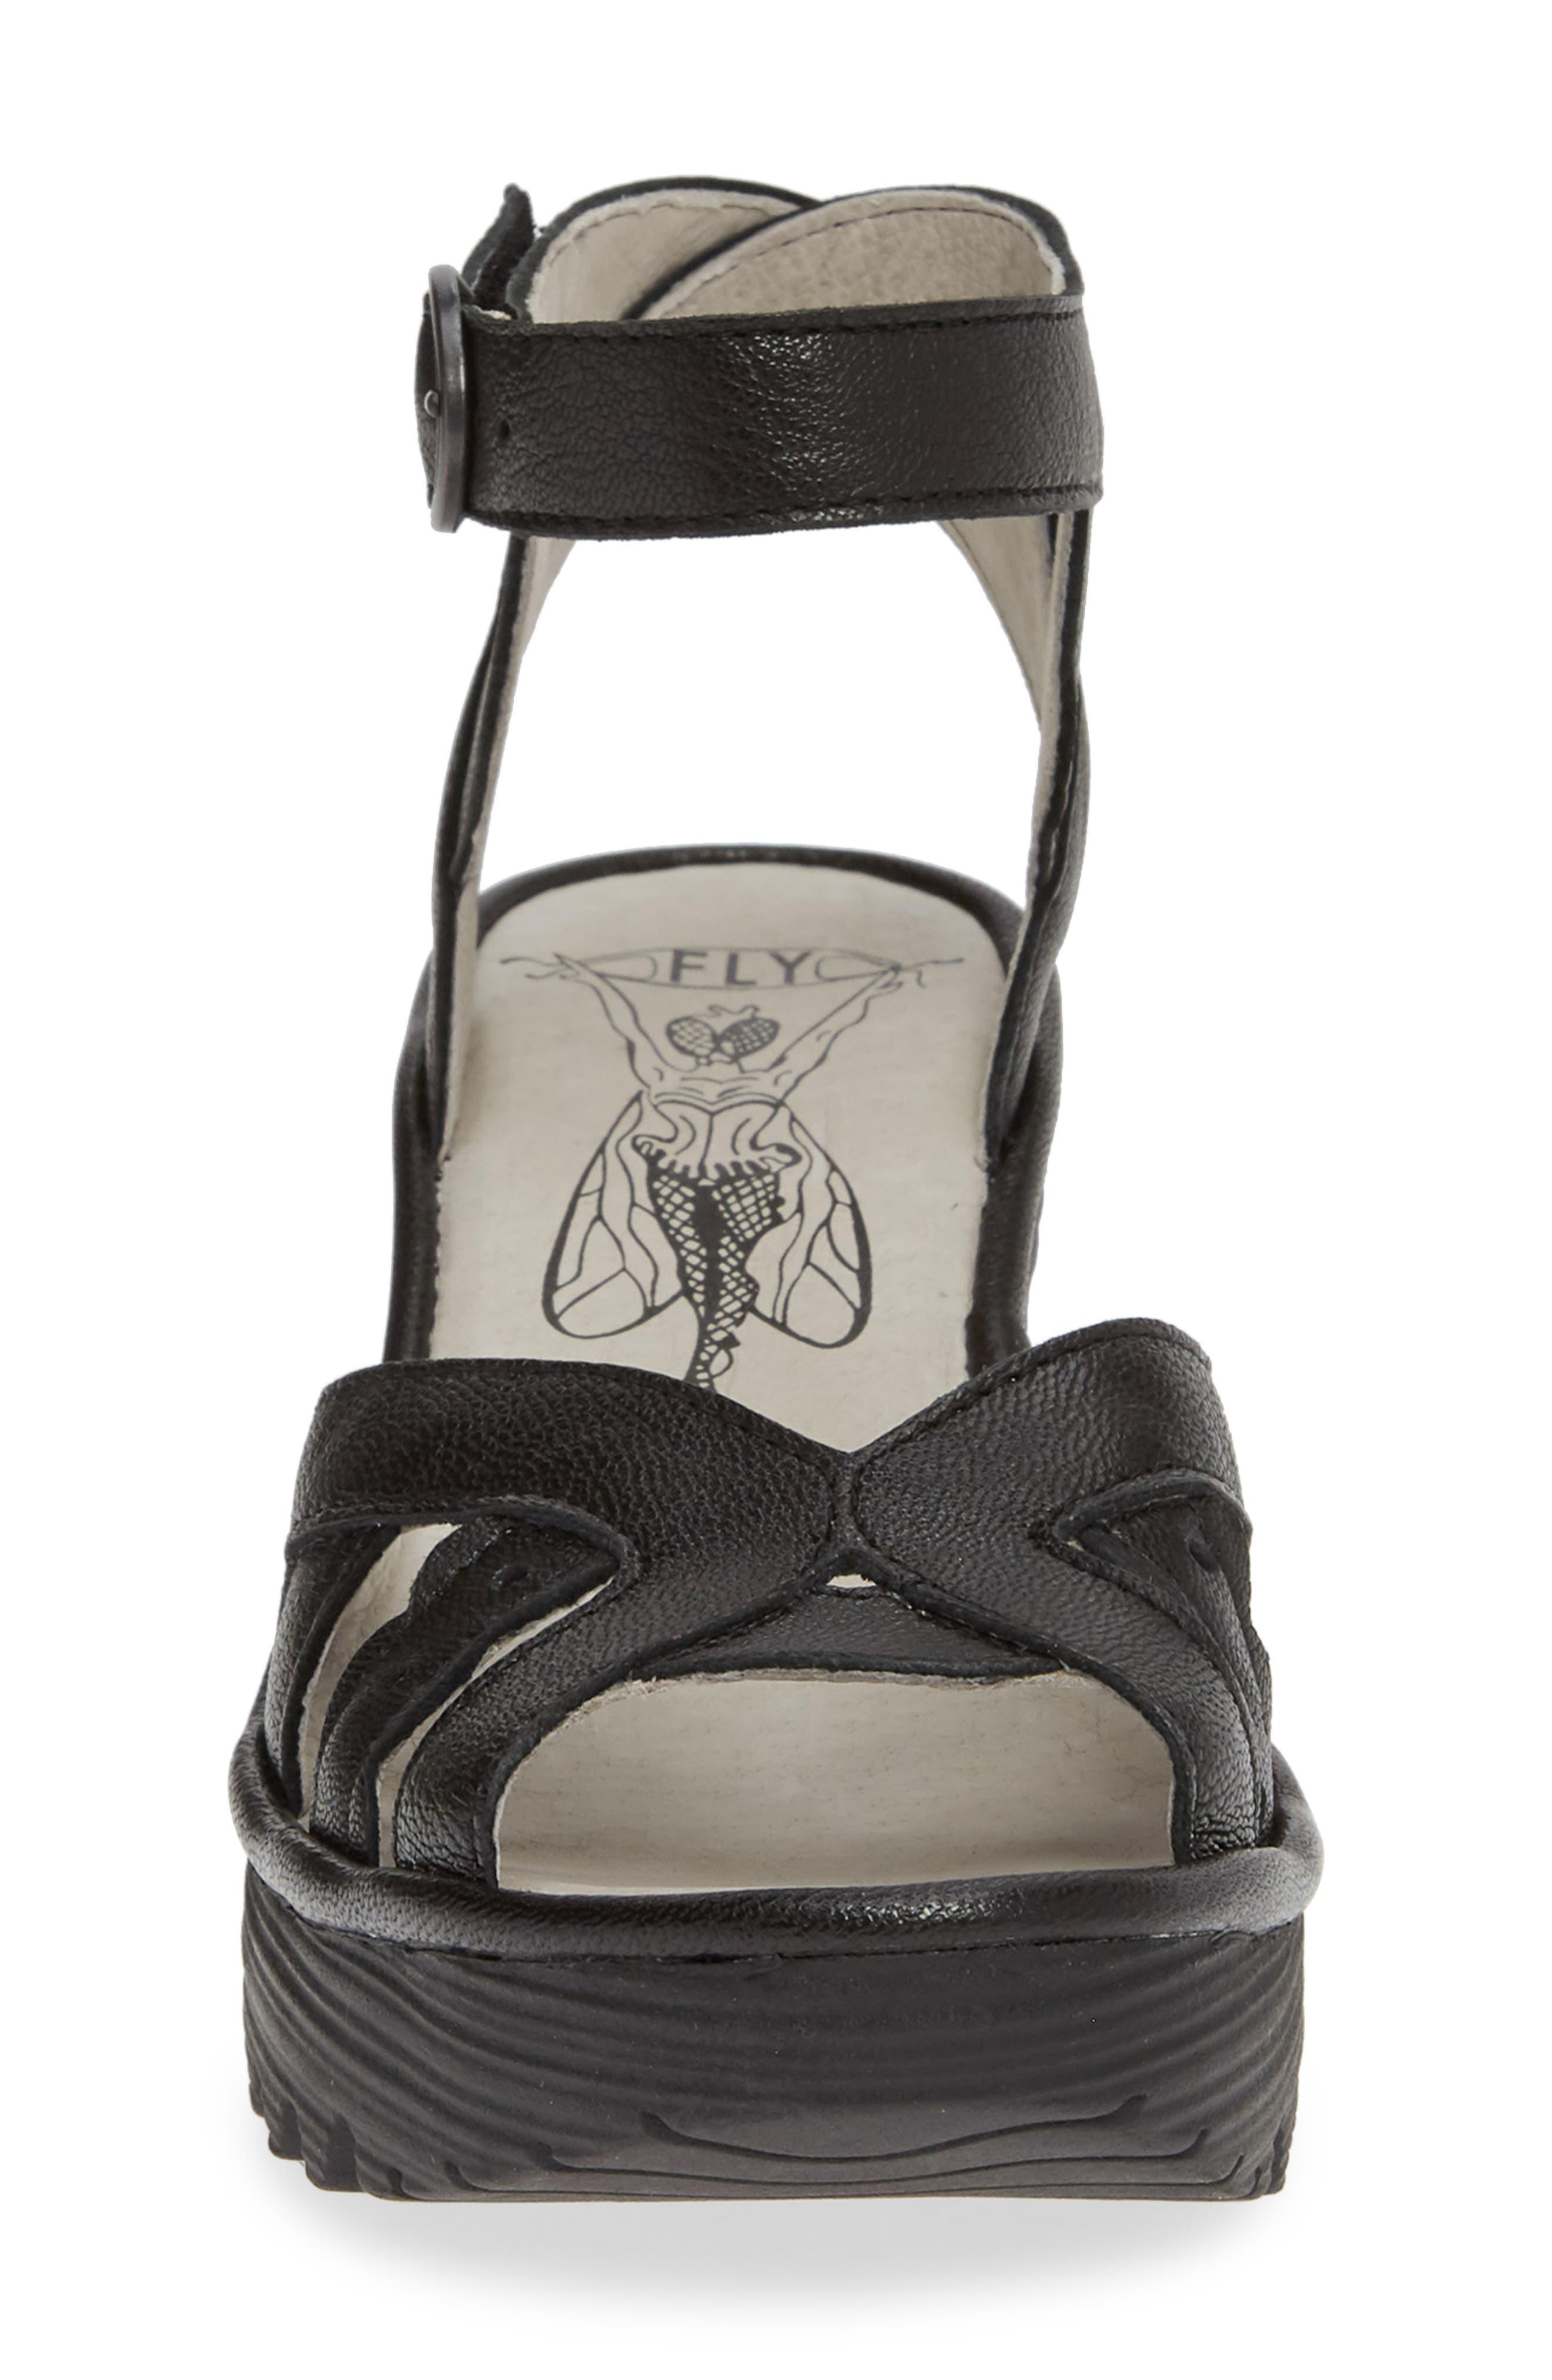 FLY LONDON, Yrat Wedge Sandal, Alternate thumbnail 4, color, BLACK LEATHER